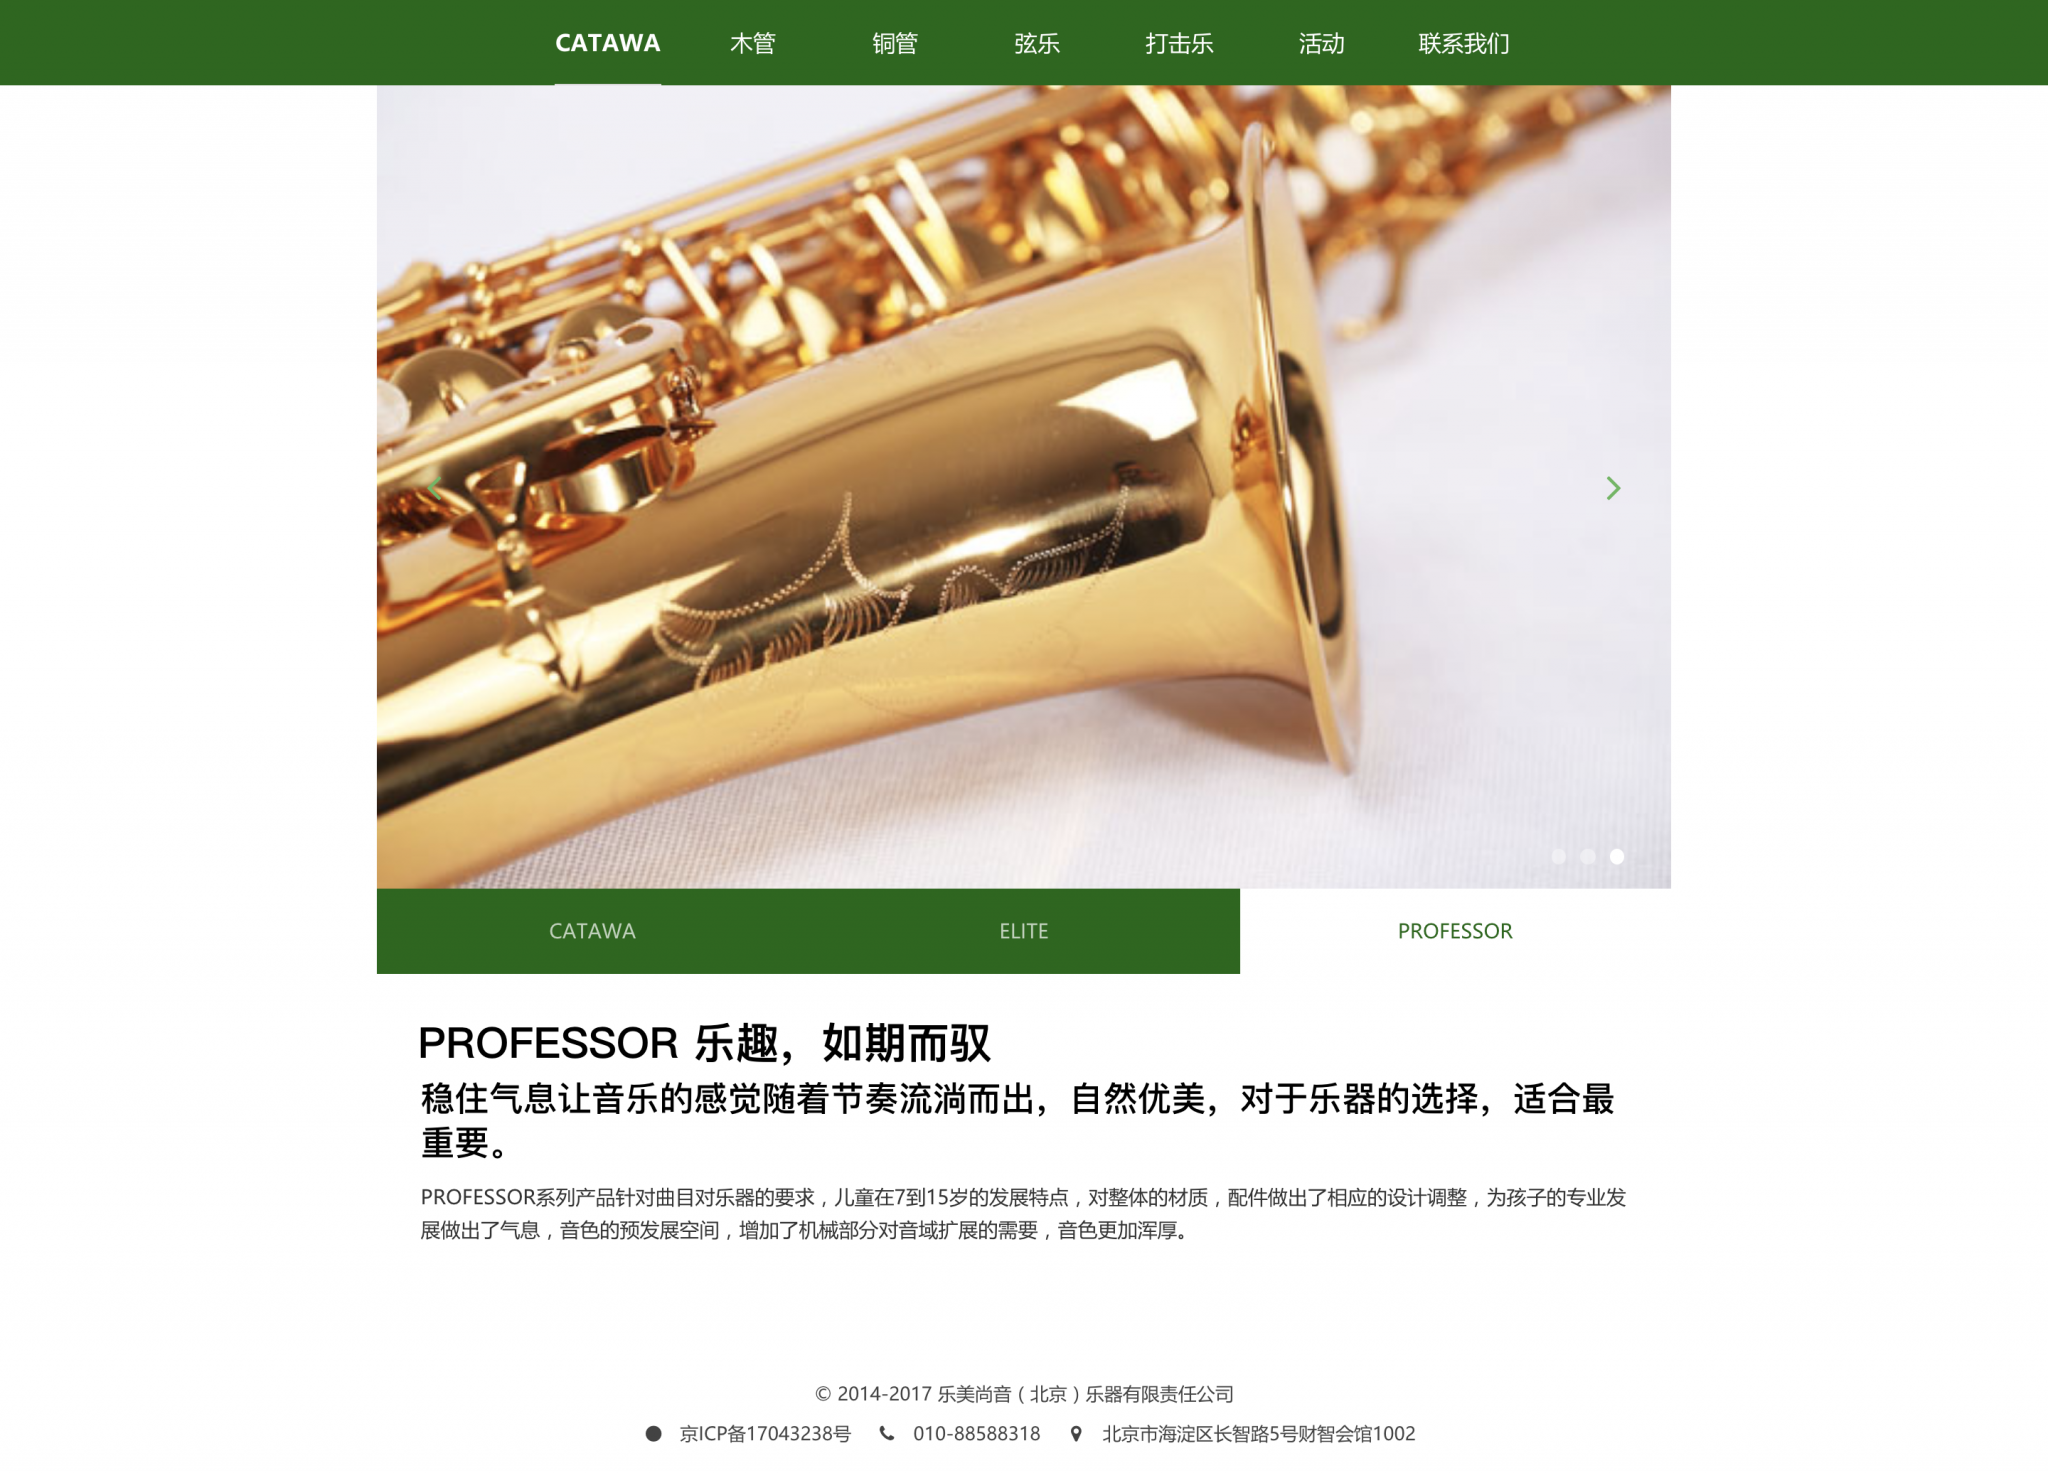 screencapture-file-Users-lyting1101-Downloads-Work-2-3-catawa-catawa-index-html-2018-09-18-09_21_54